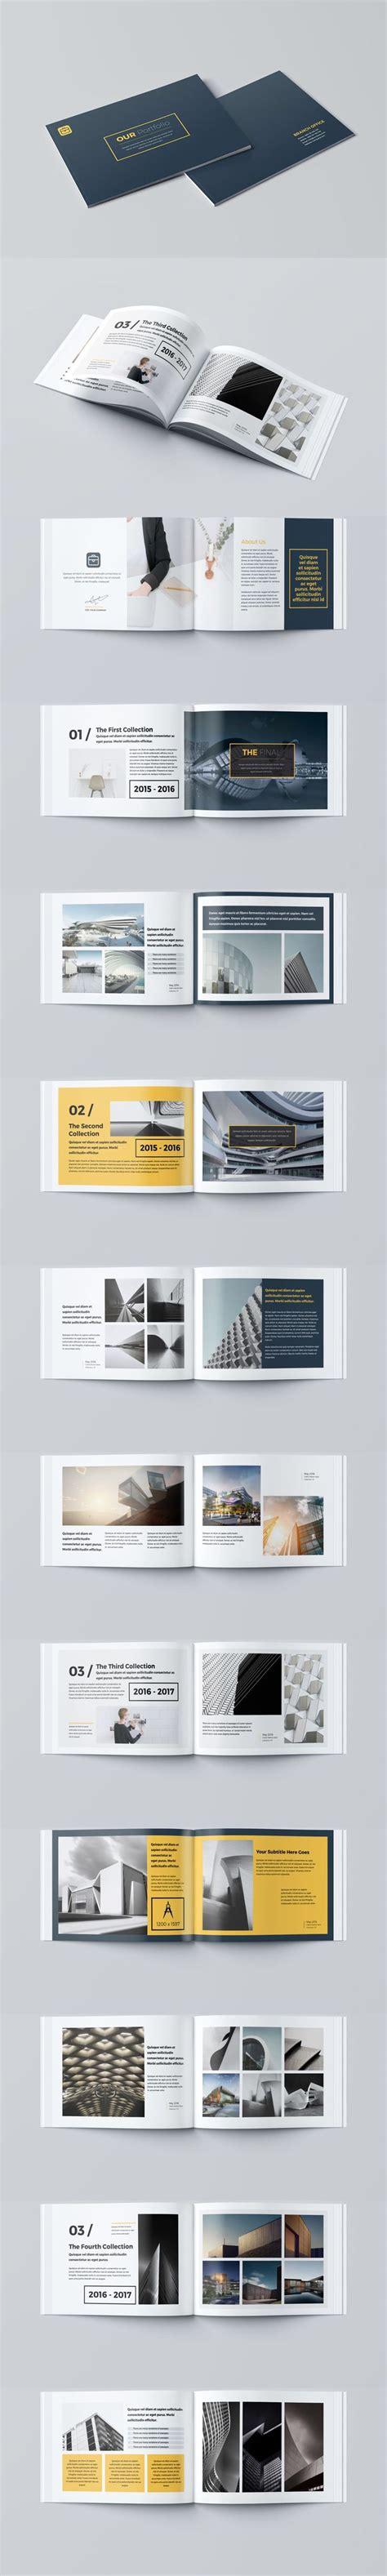 Best 25 Architecture Portfolio Layout Ideas On Pinterest Architecture Portfolio Indesign Portfolio Template Architecture